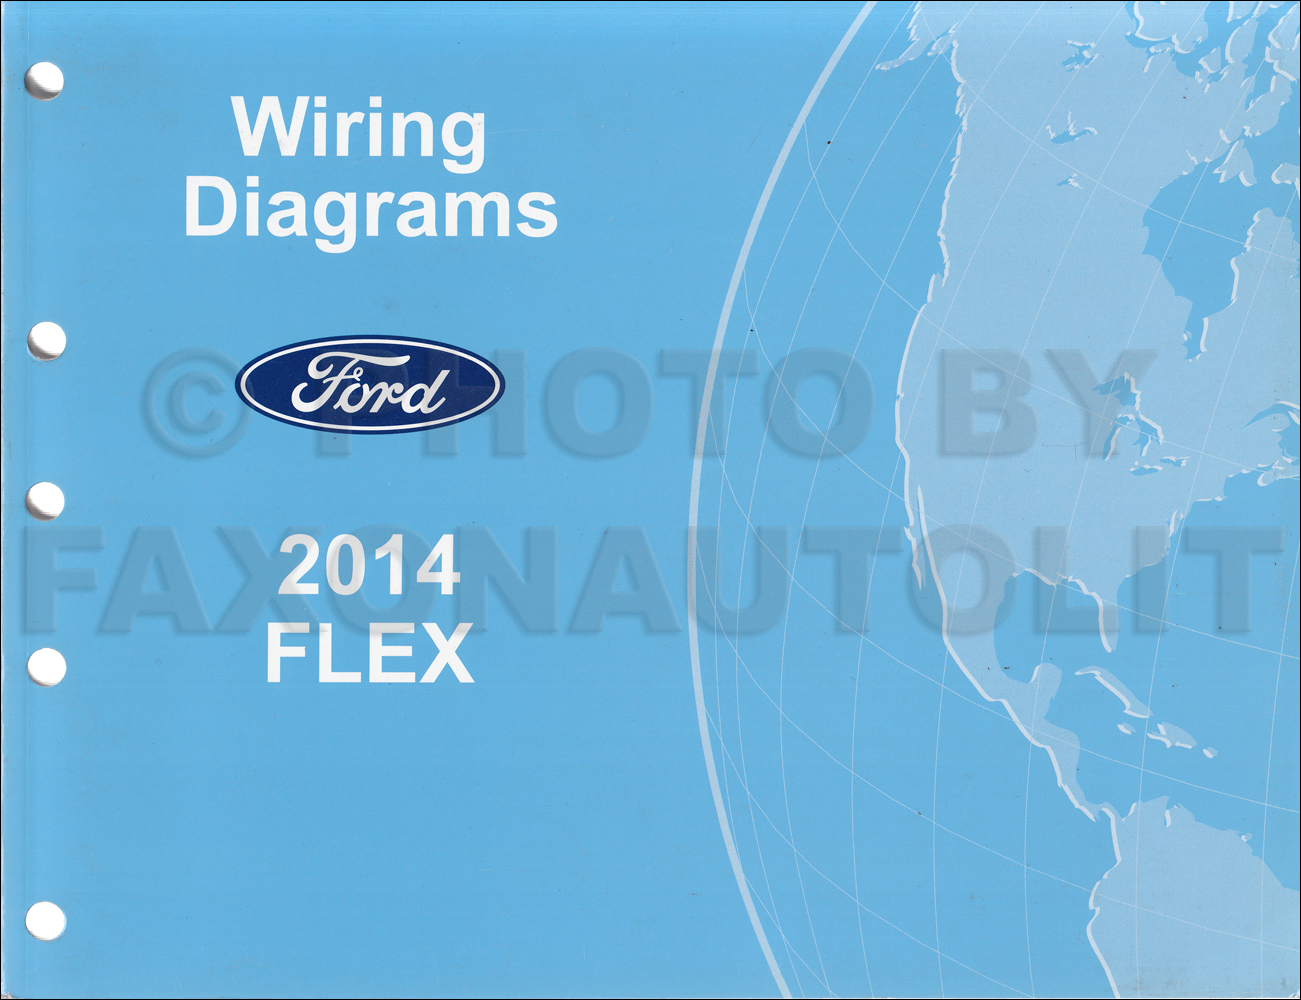 hight resolution of 2014 ford flex wiring diagram manual original wiring diagram ford flex